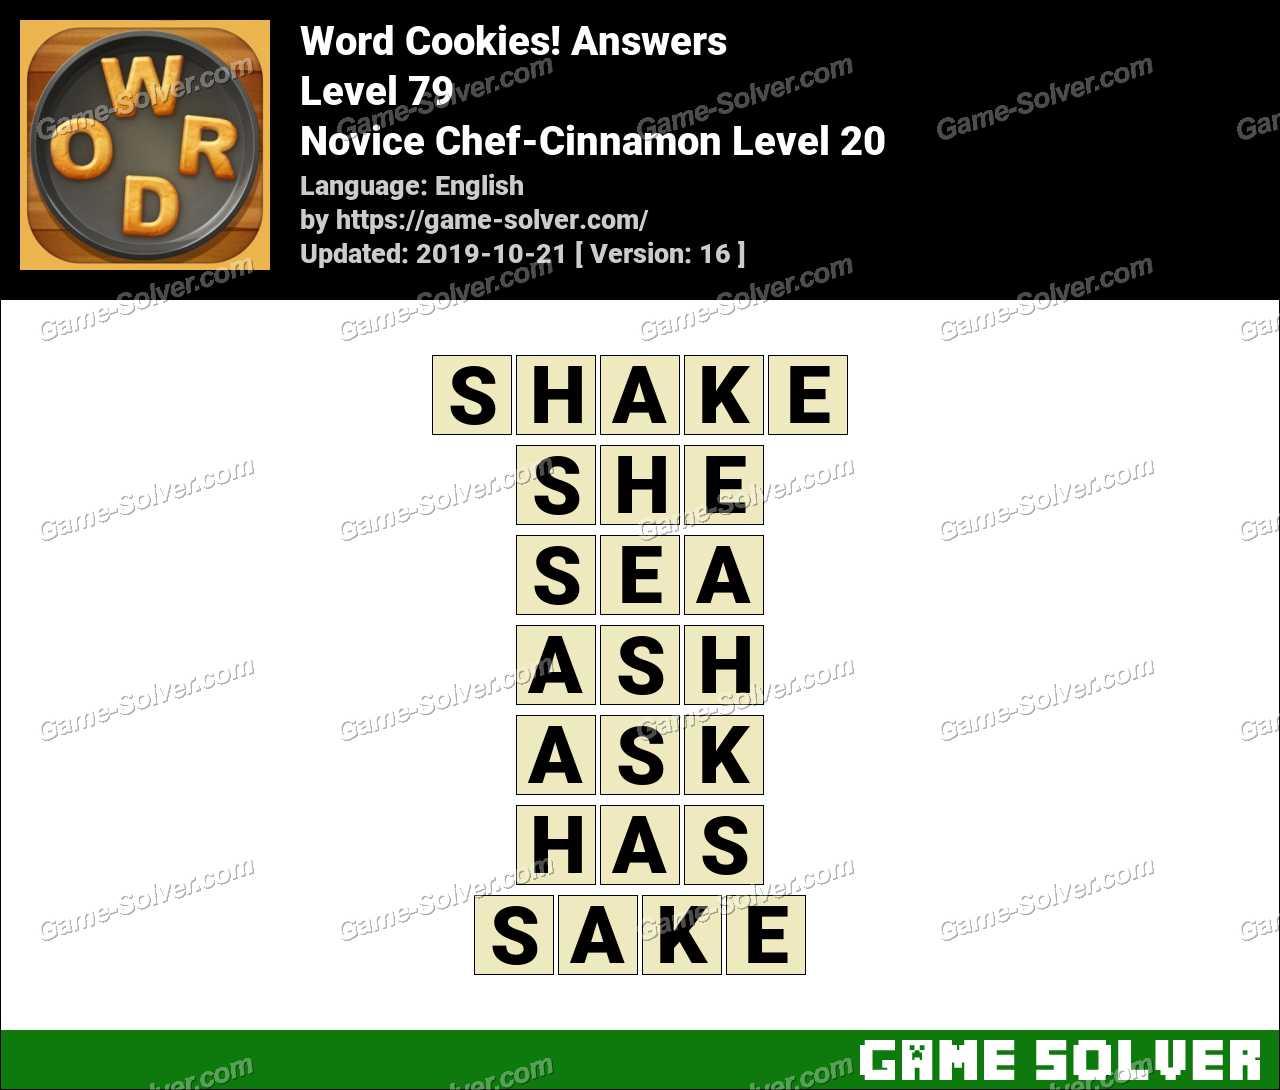 Word Cookies Novice Chef-Cinnamon Level 20 Answers